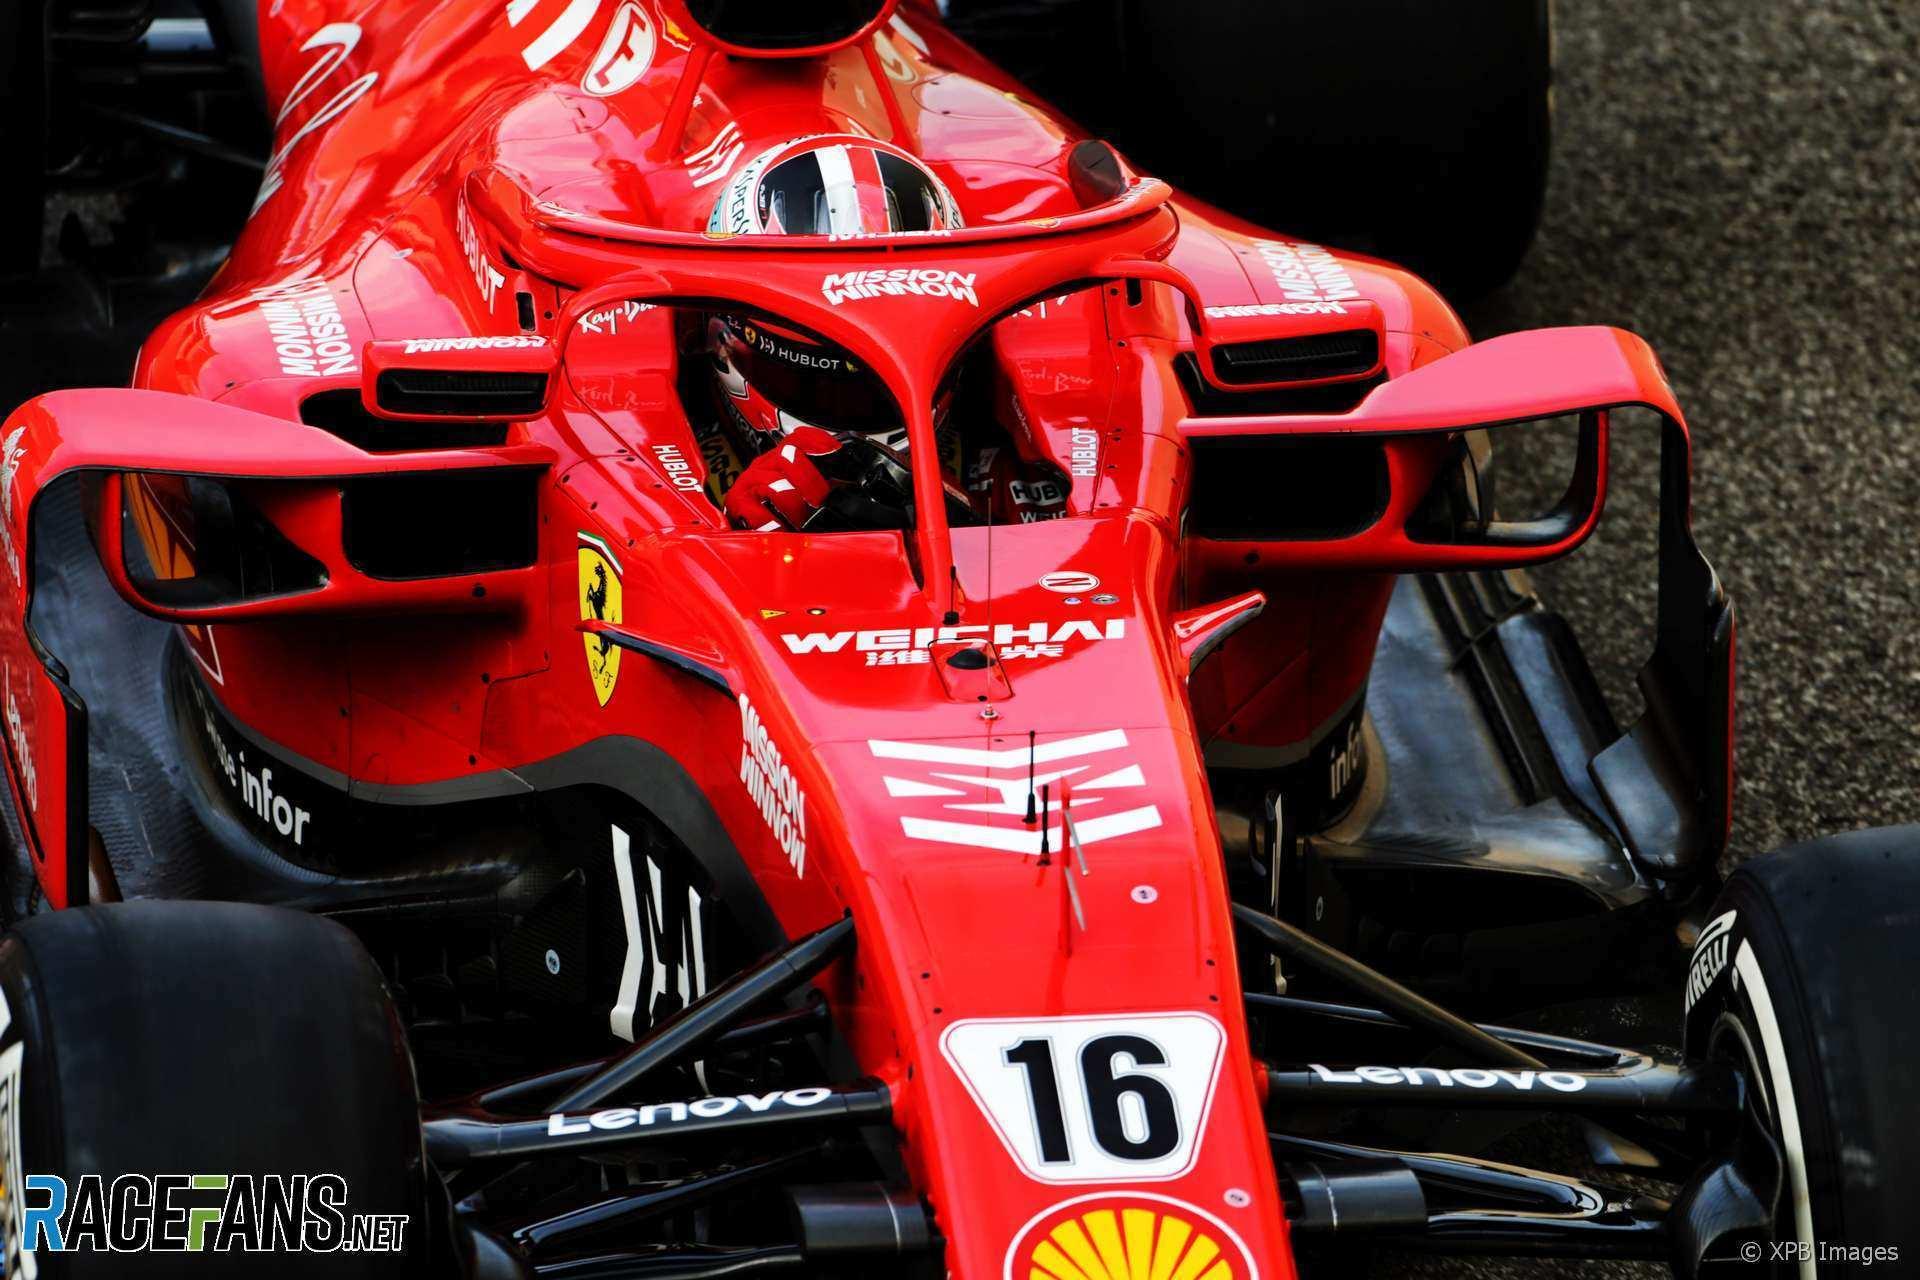 48 Best Review Best Ferrari Leclerc 2019 Specs And Review Specs for Best Ferrari Leclerc 2019 Specs And Review